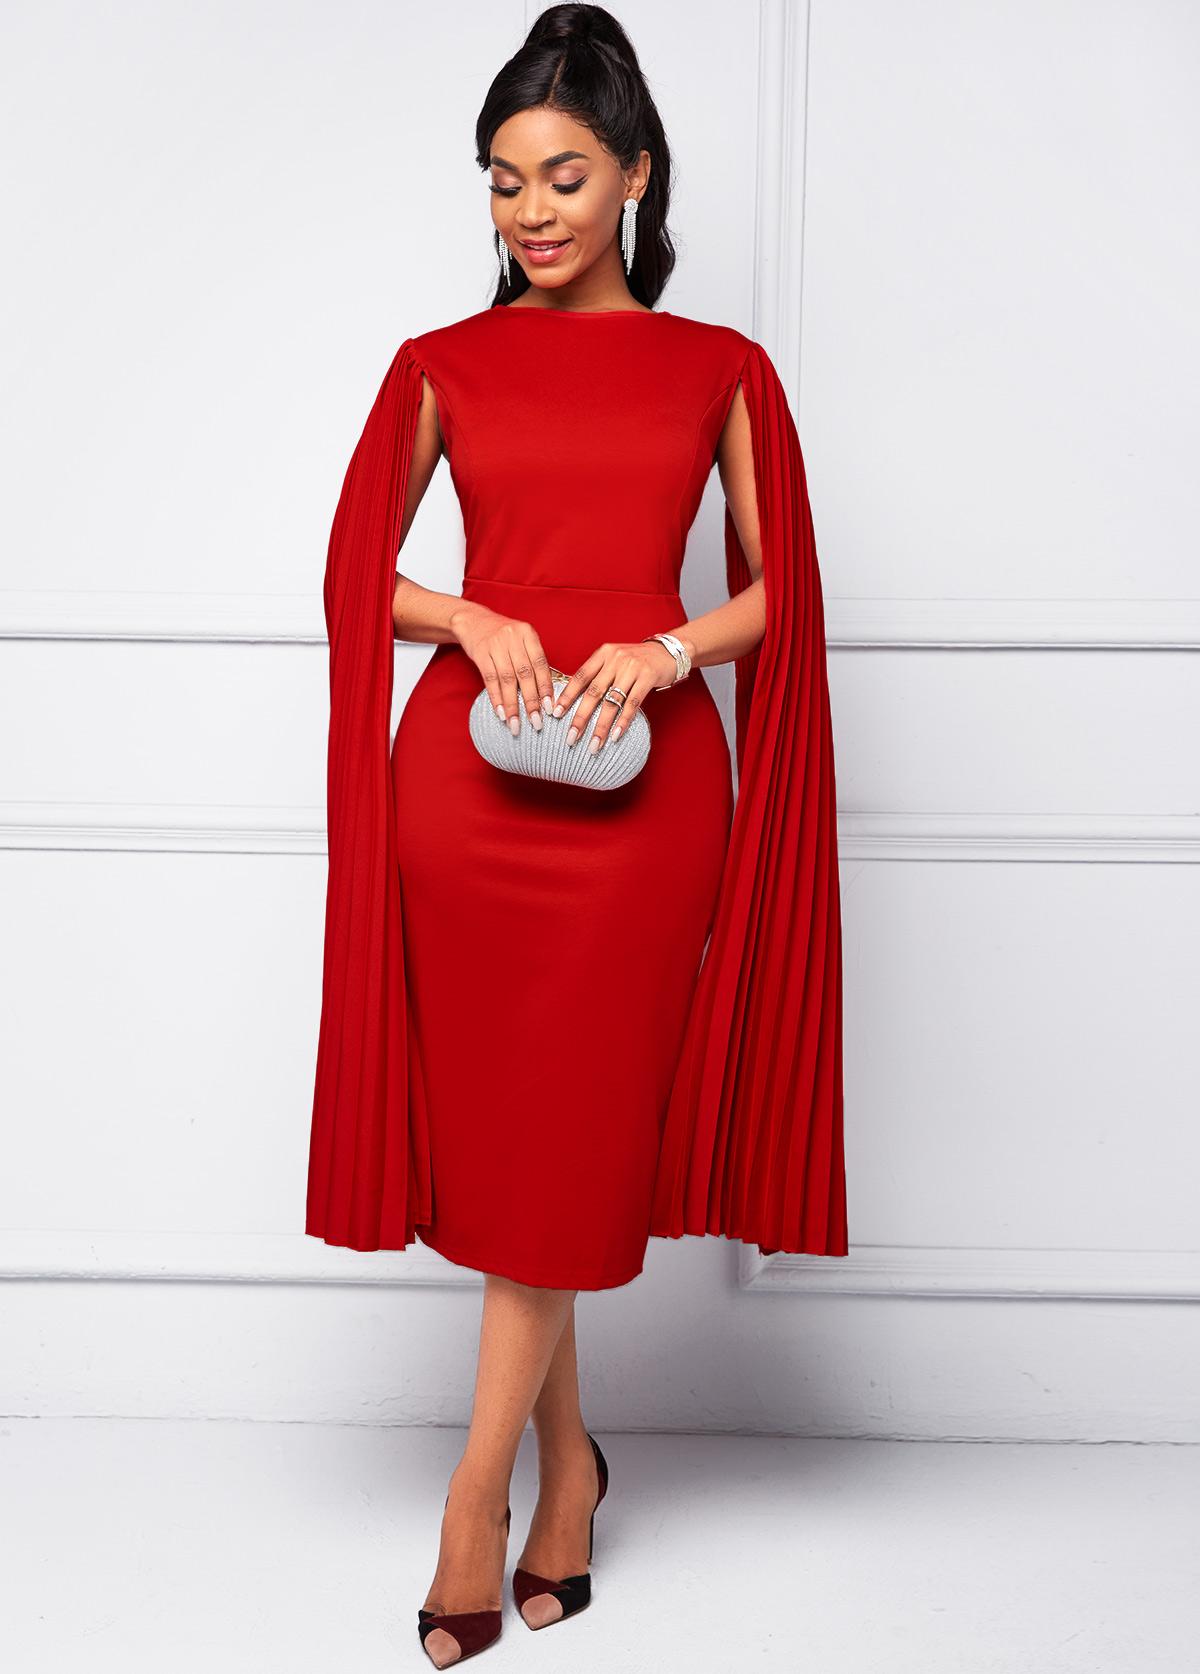 Cape Sleeve Red Round Neck Bodycon Dress